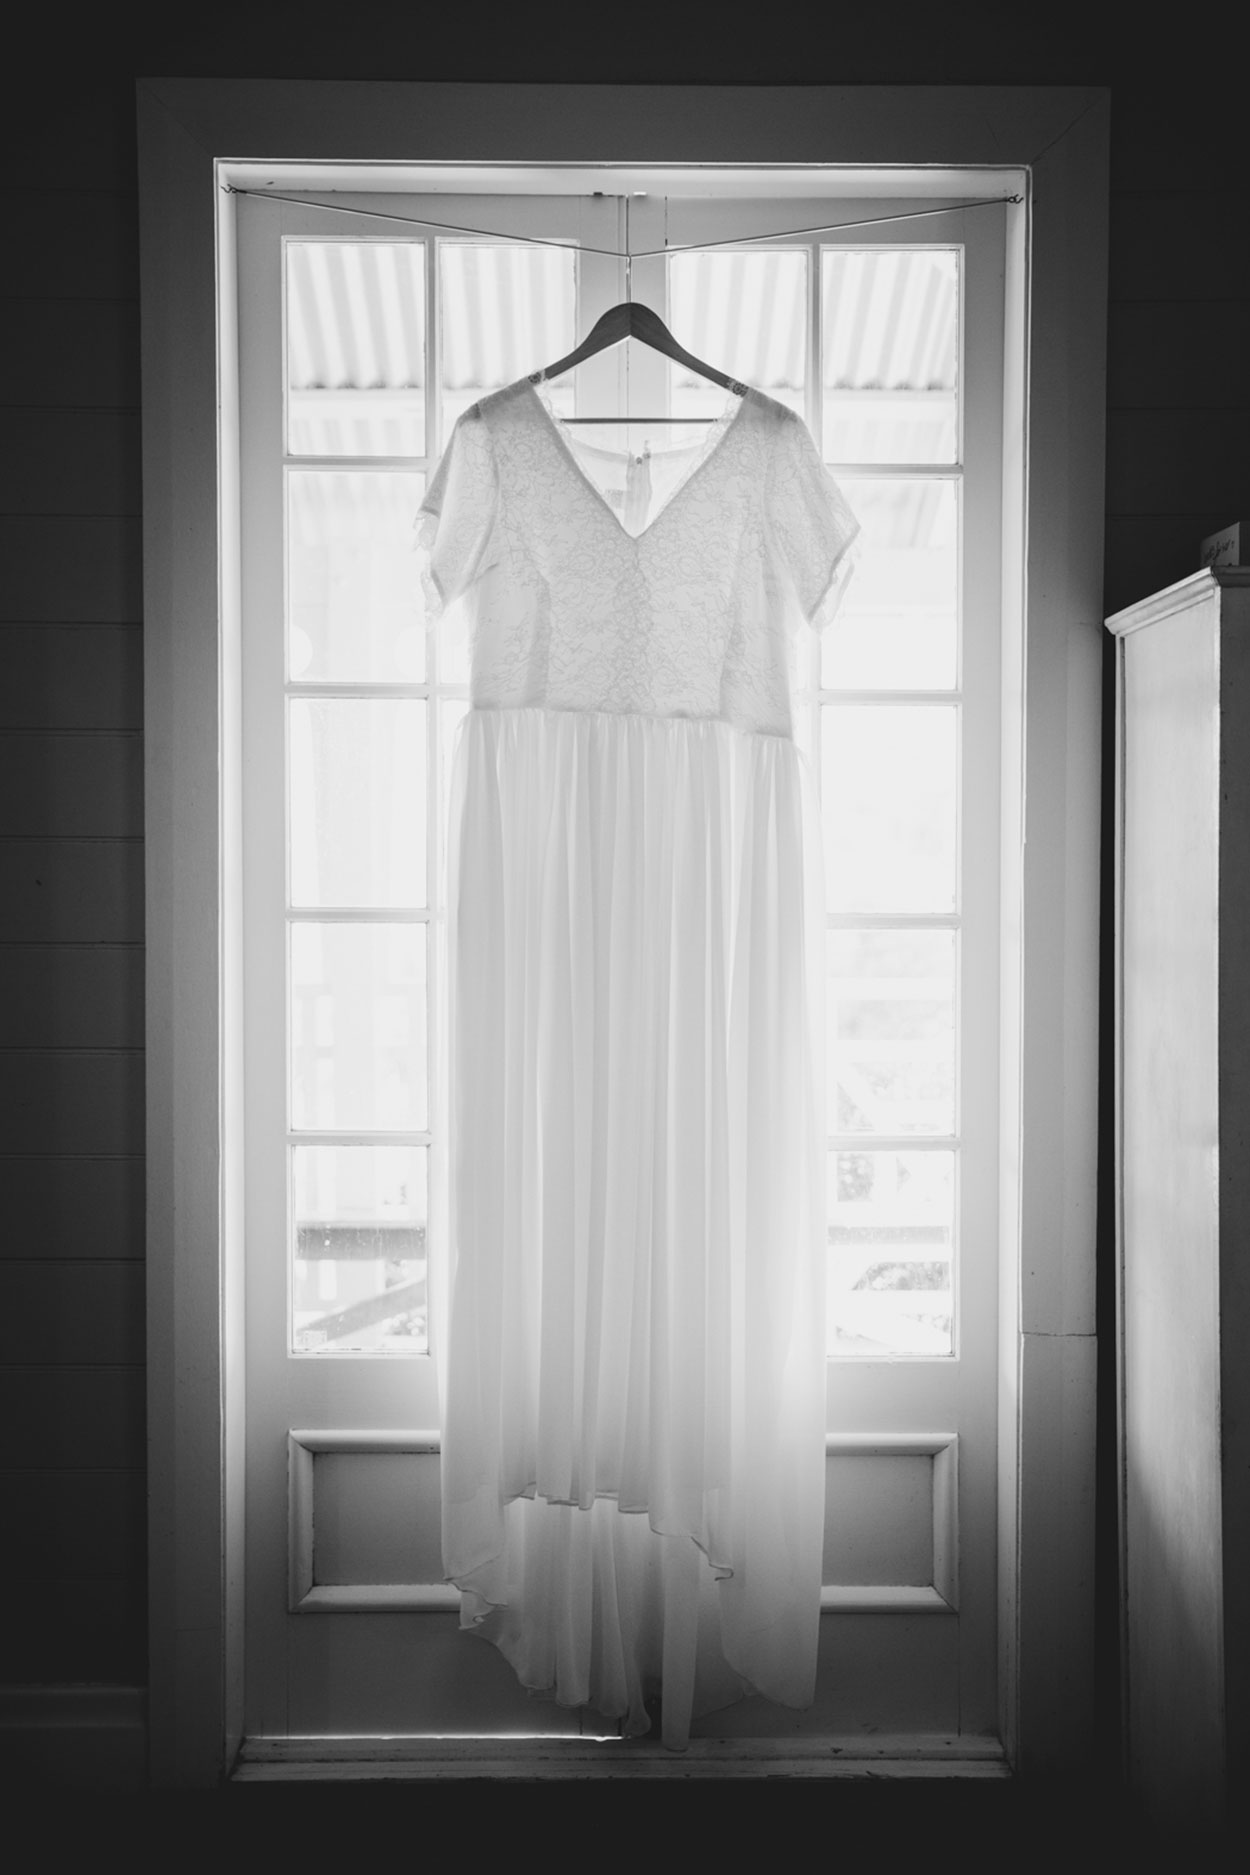 Queensland, Australian Wedding Dress - Noosa, Sunshine Coast Destination Wedding Photographer